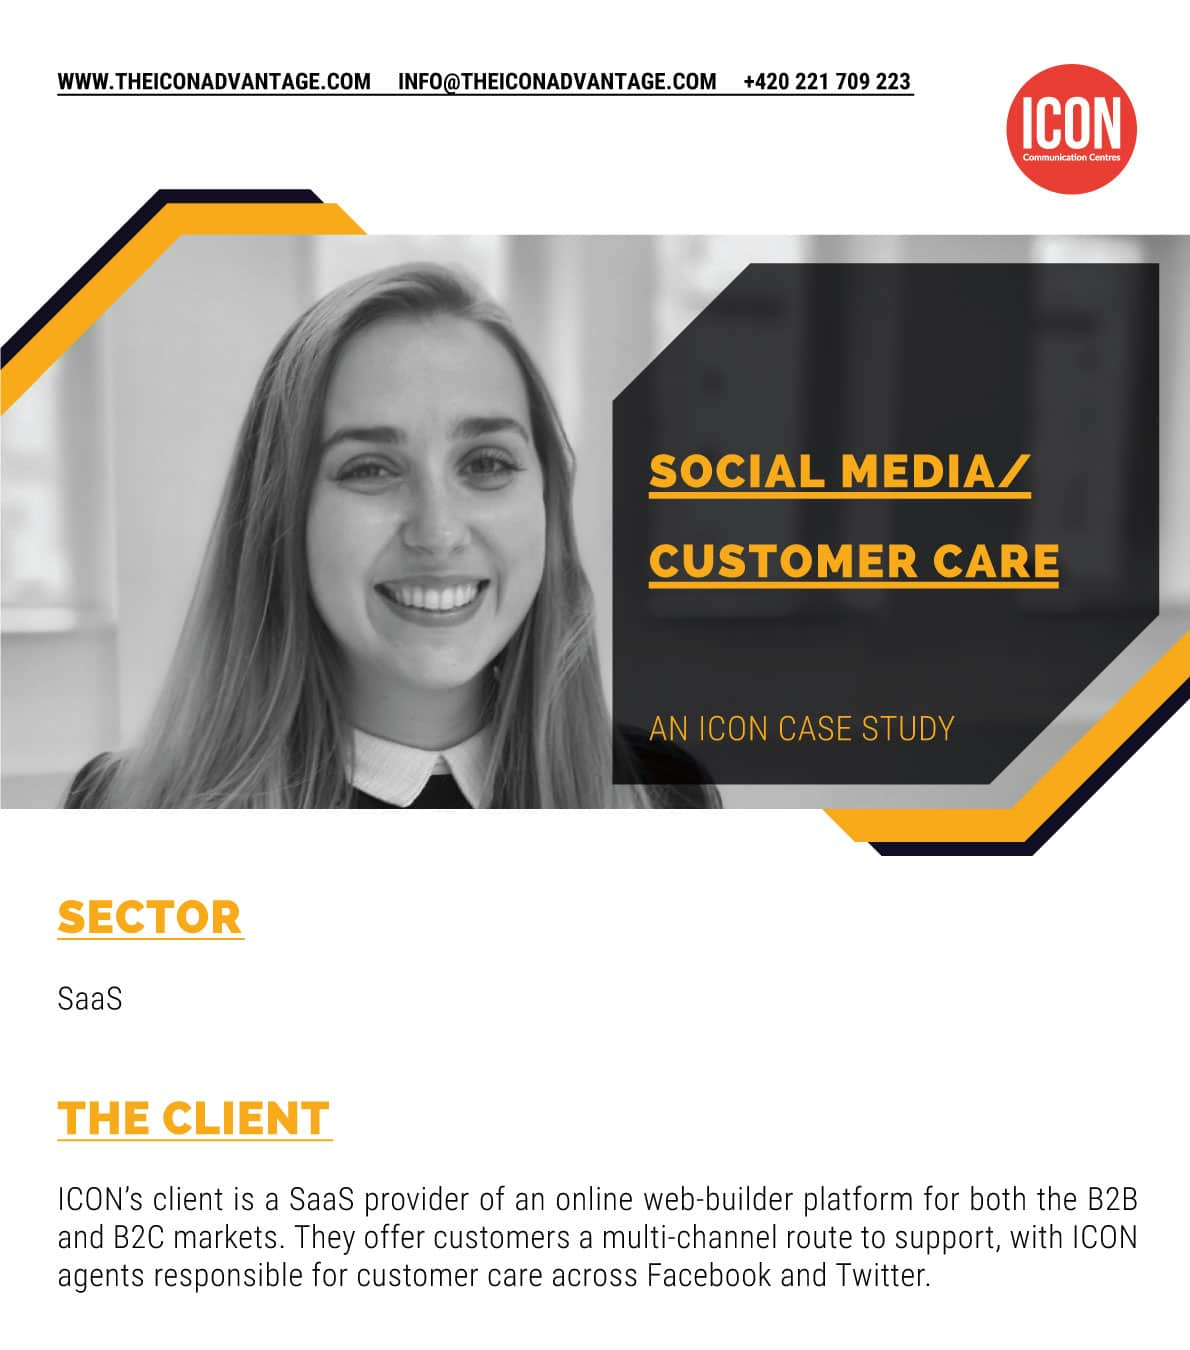 icon_case_study_social_media_customer_care_1